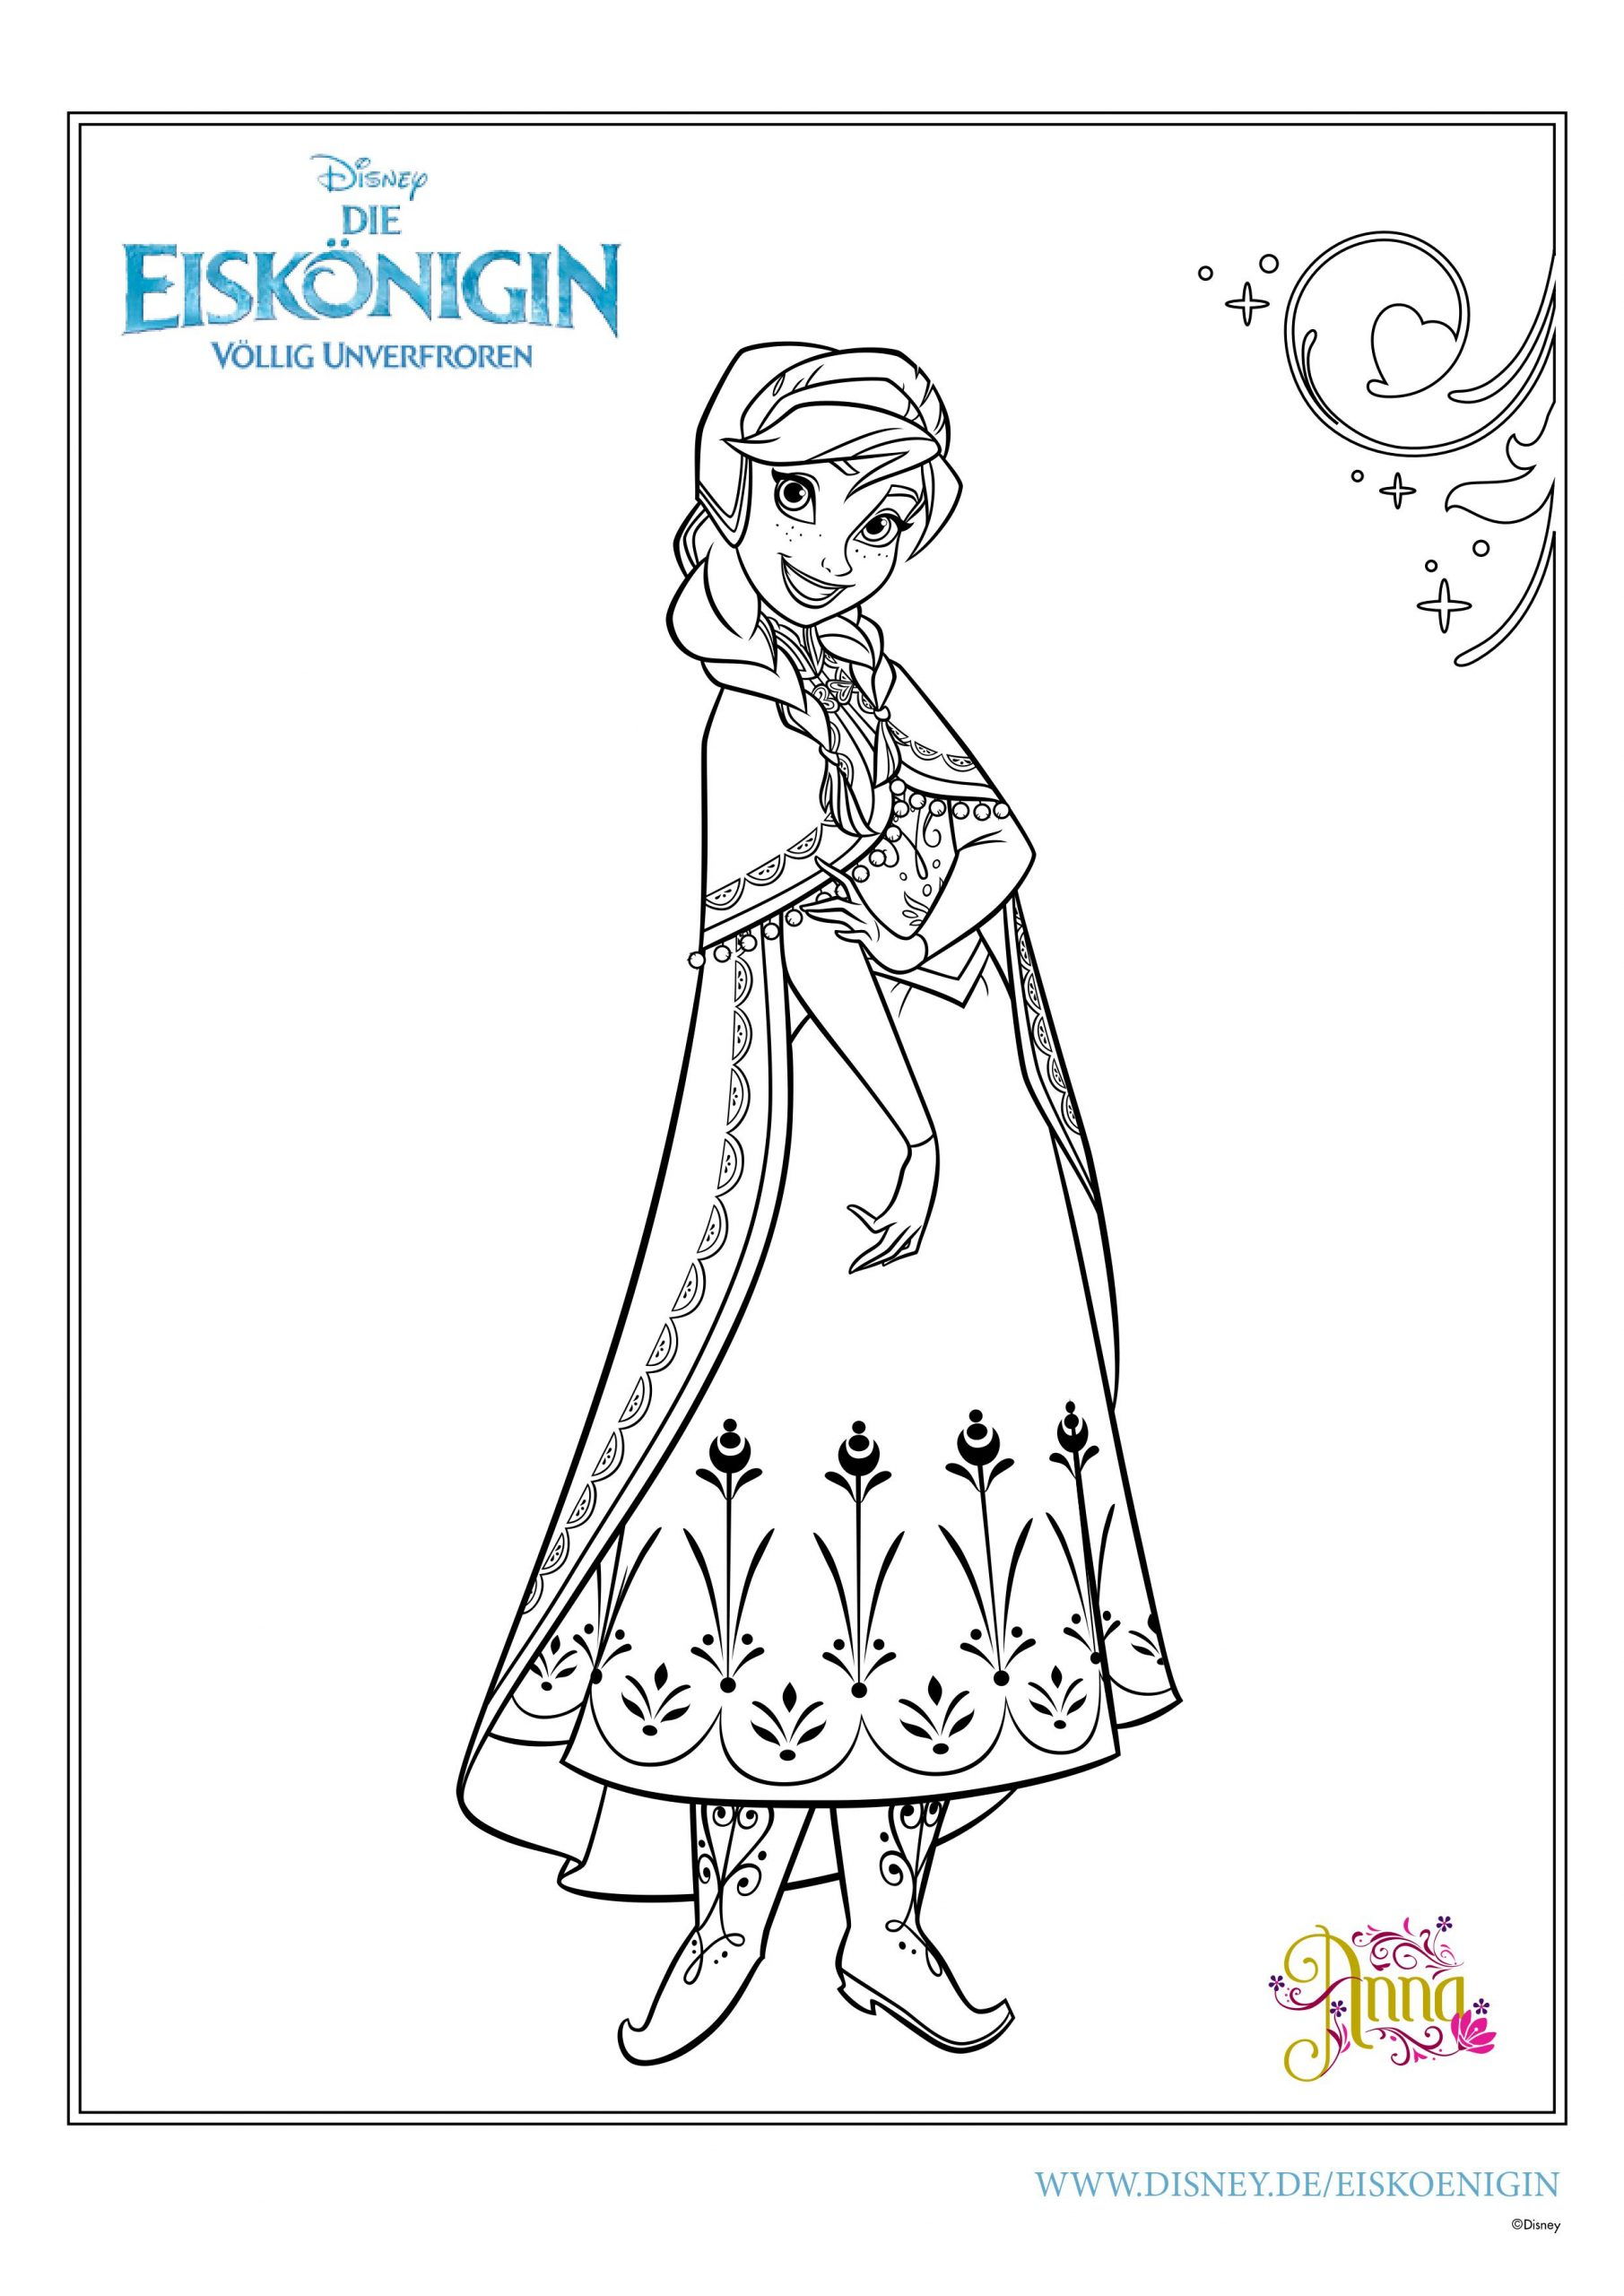 Ausmalbilder Eiskönigin | Mytoys-Blog in Gratis Malvorlagen Disney